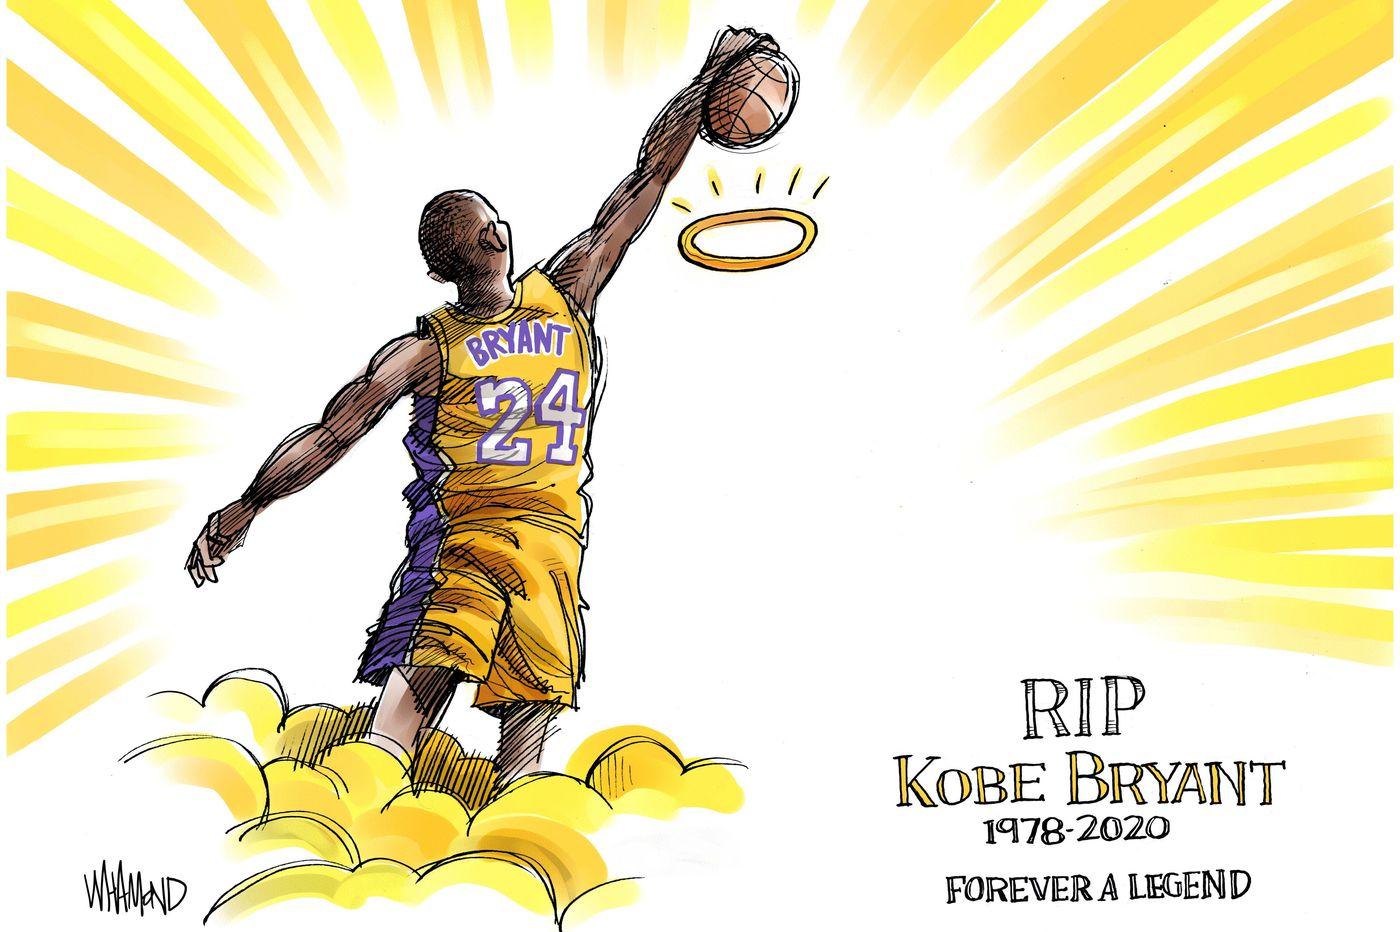 Cartoons Kobe Bryants death memorialized by artists around the 1400x932